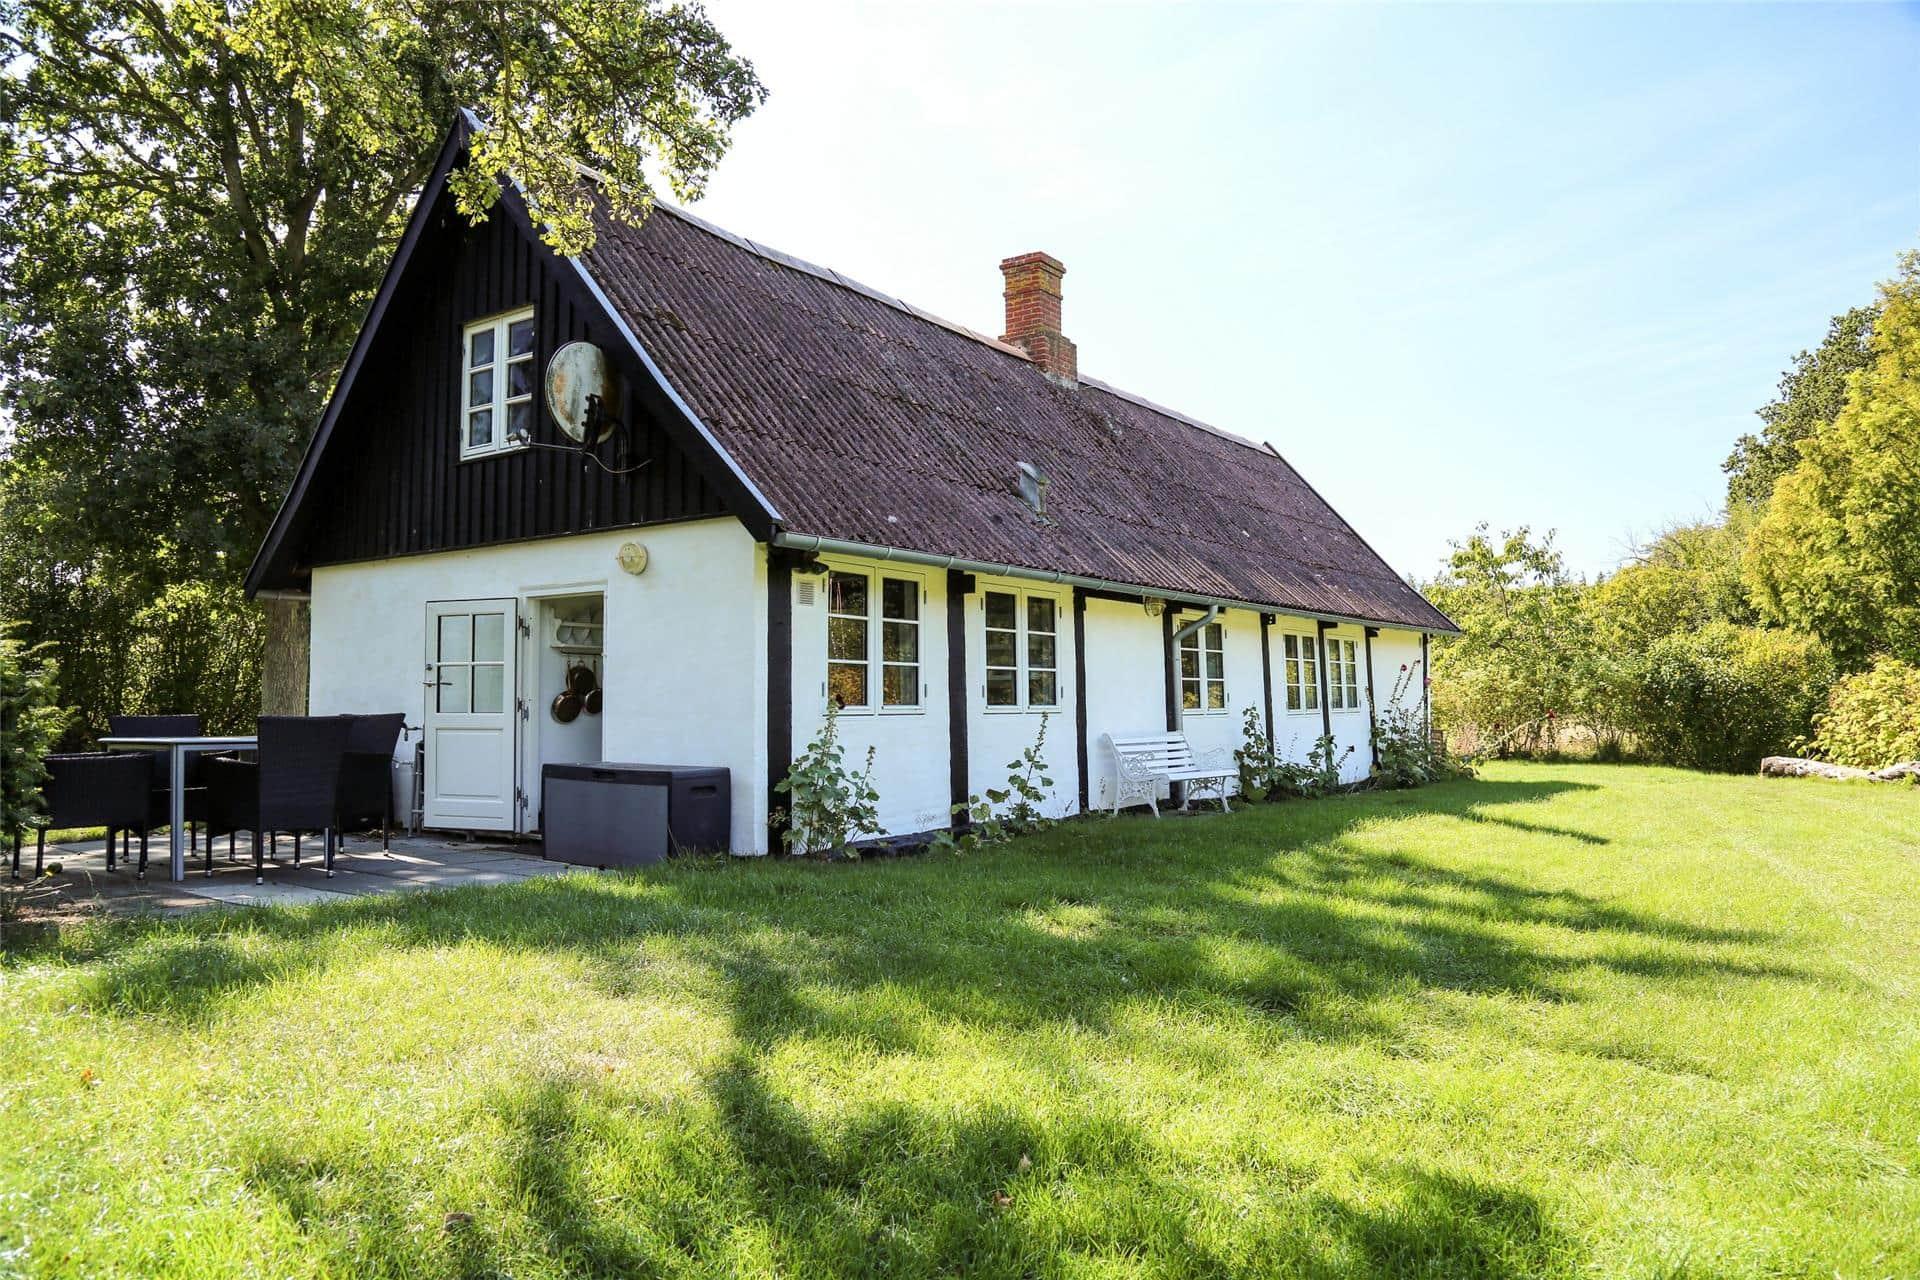 Bild 1-10 Ferienhaus 6719, Nyker Strandvej 89, DK - 3700 Rønne